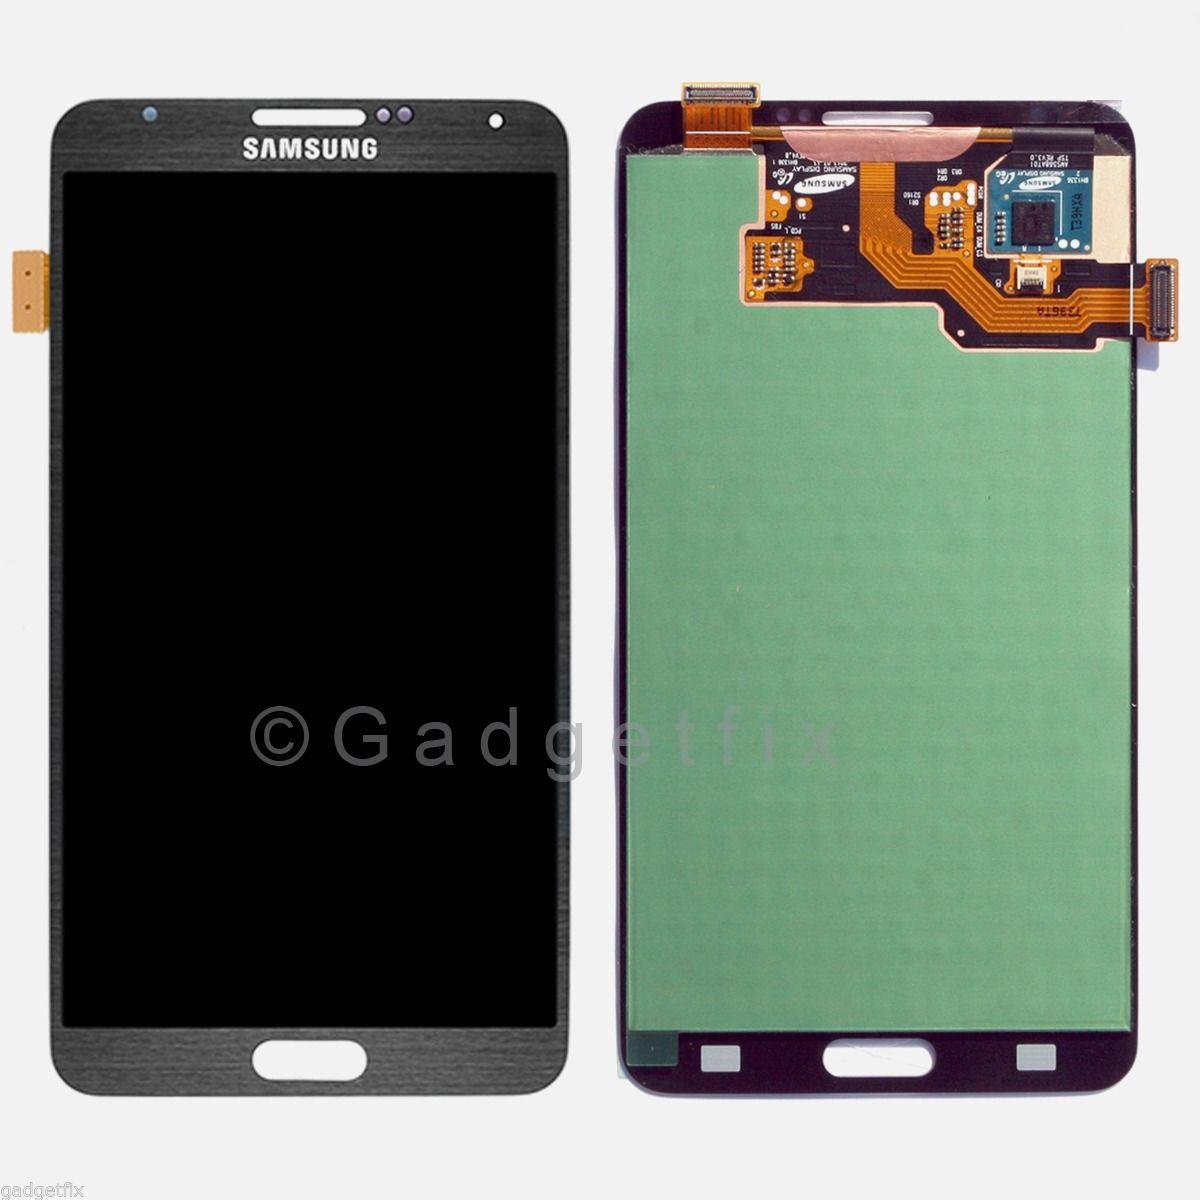 OEM Samsung Galaxy Note 3 N9000 N900A N900T LCD Display Touch Screen Digitizer